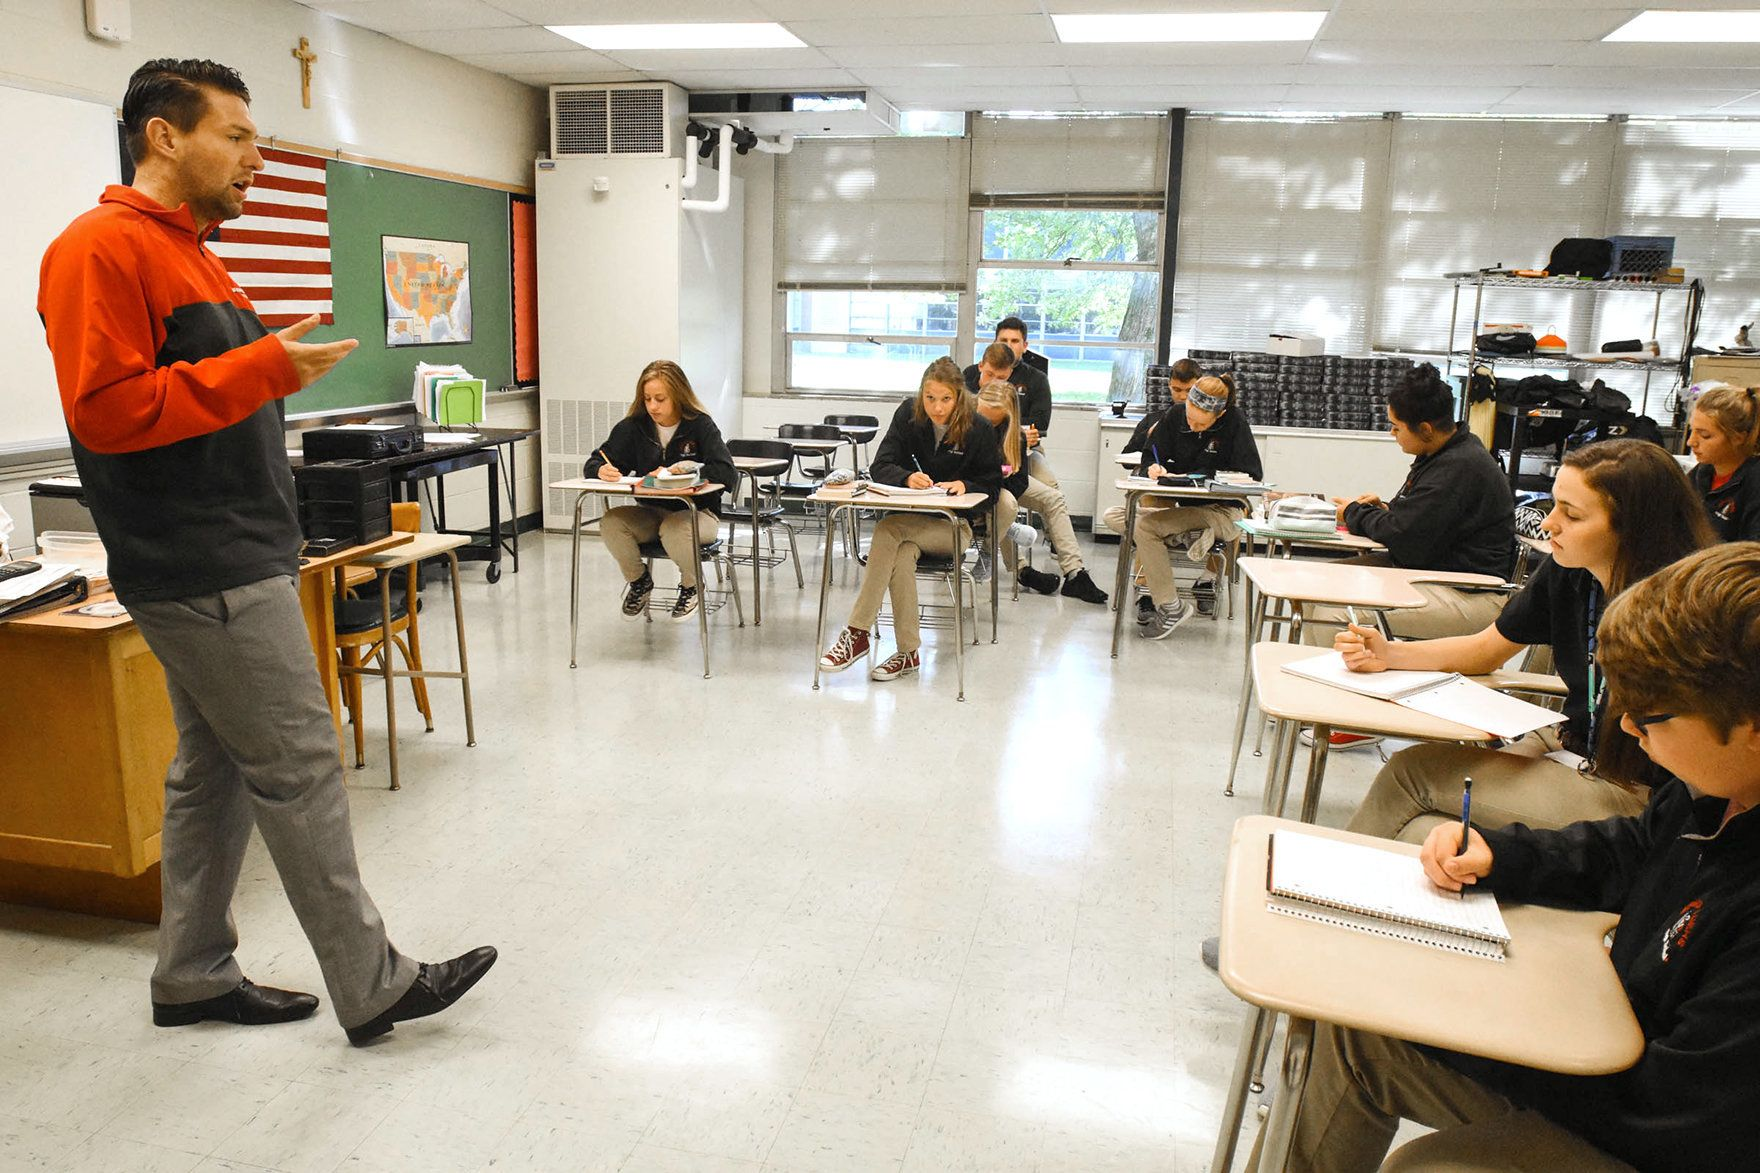 Jordan Miller teaches a junior English class at Bishop Luers High School in Fort Wayne.